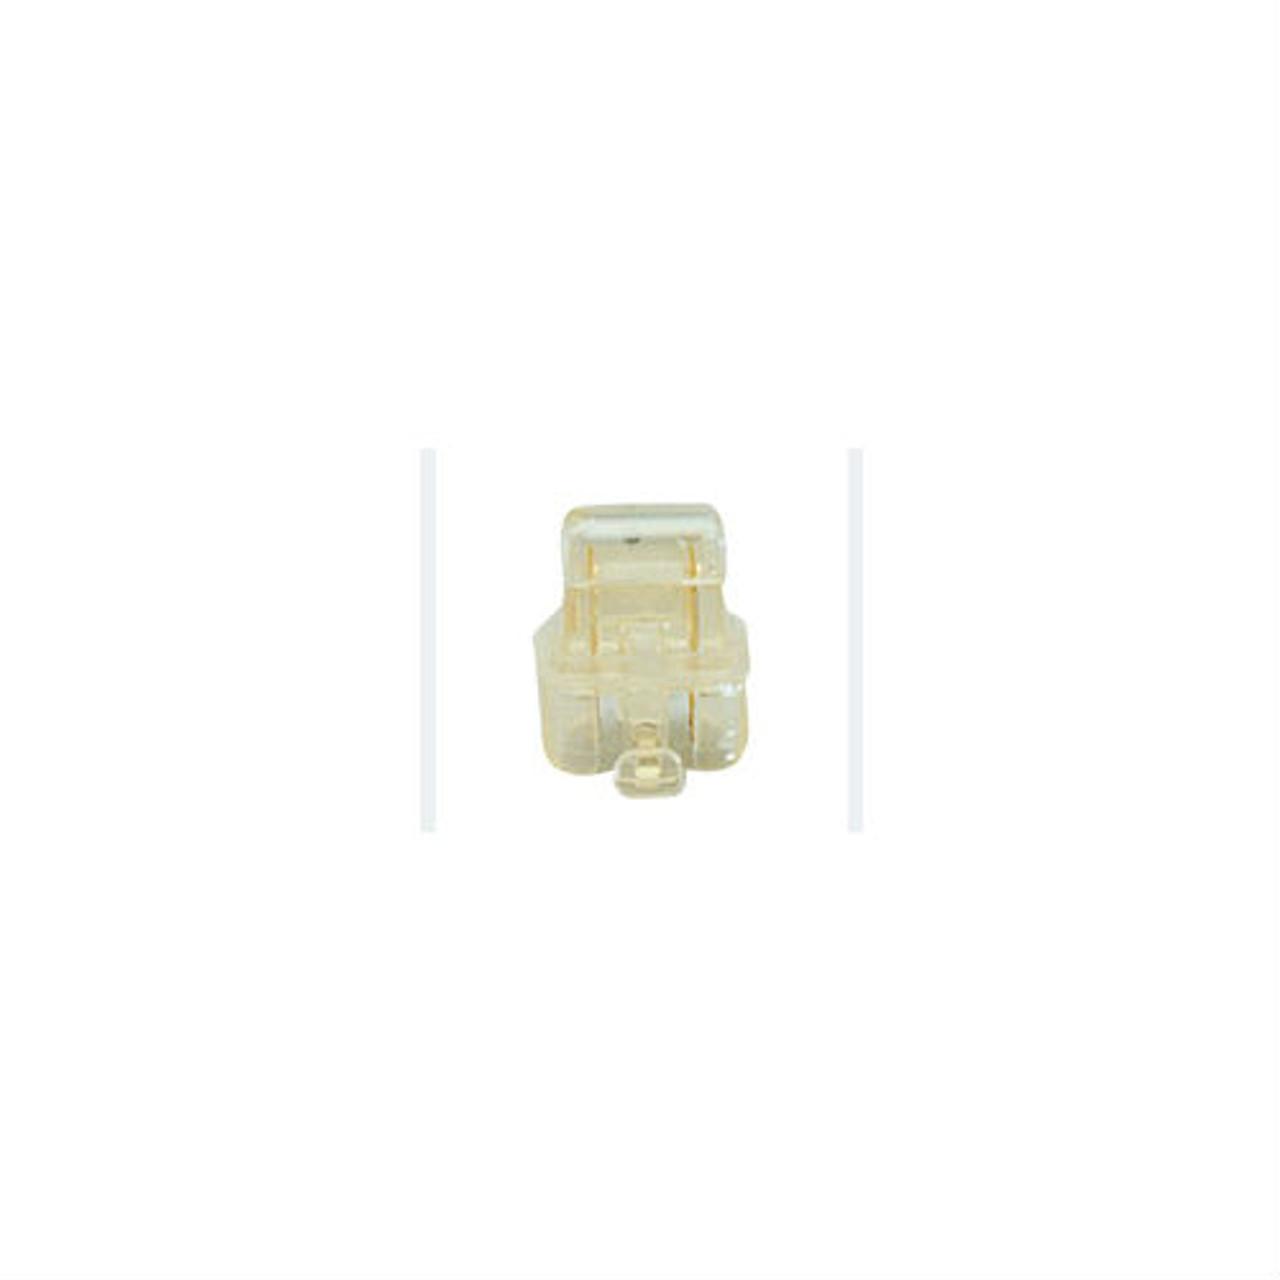 Drager Neo Flow Sensor Insert (pack of 5)  Part Number 8410179